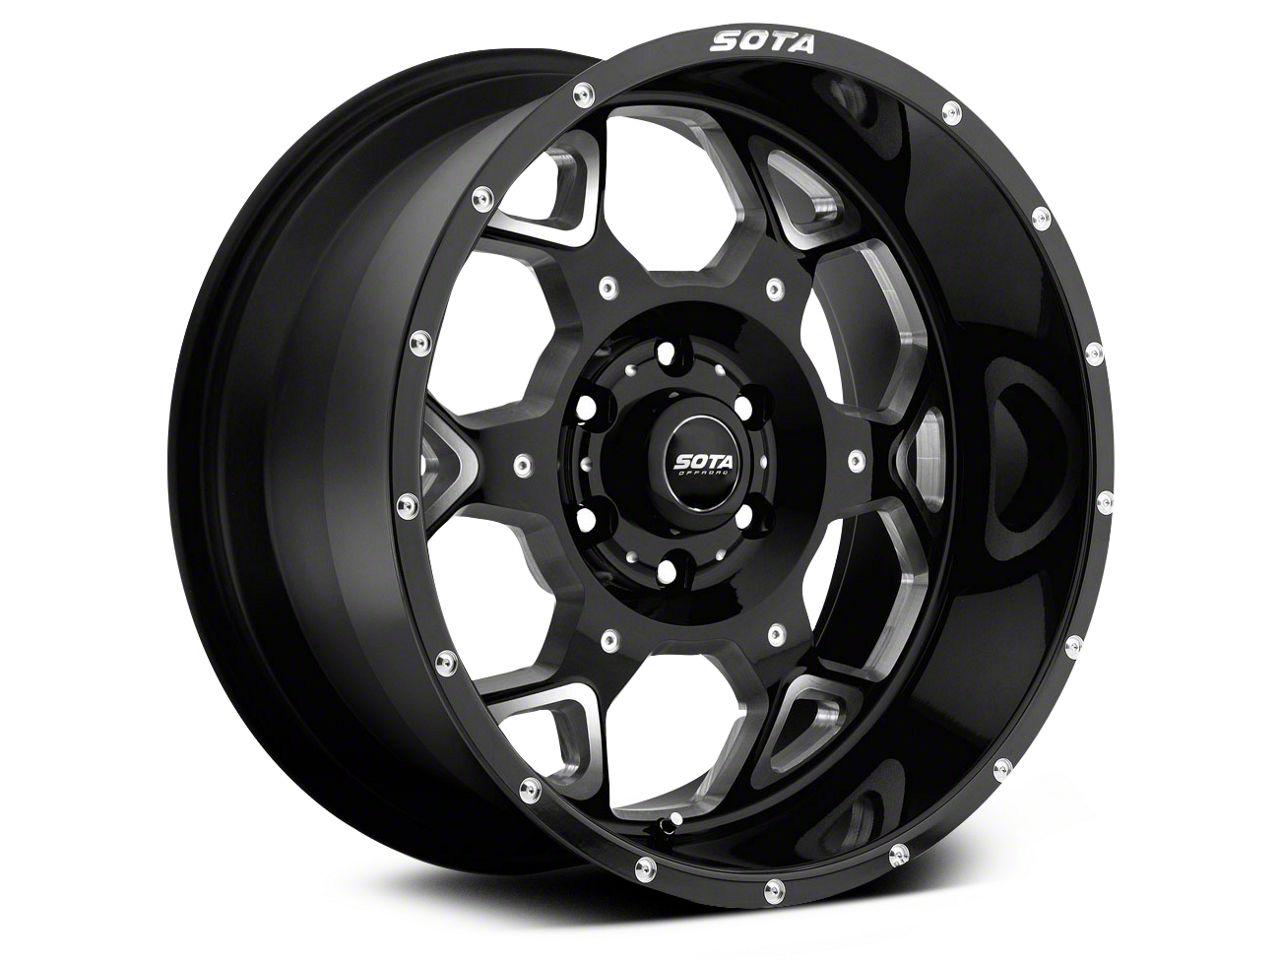 SOTA Off Road SKUL Death Metal 6-Lug Wheel - 20x10 (99-18 Silverado 1500)